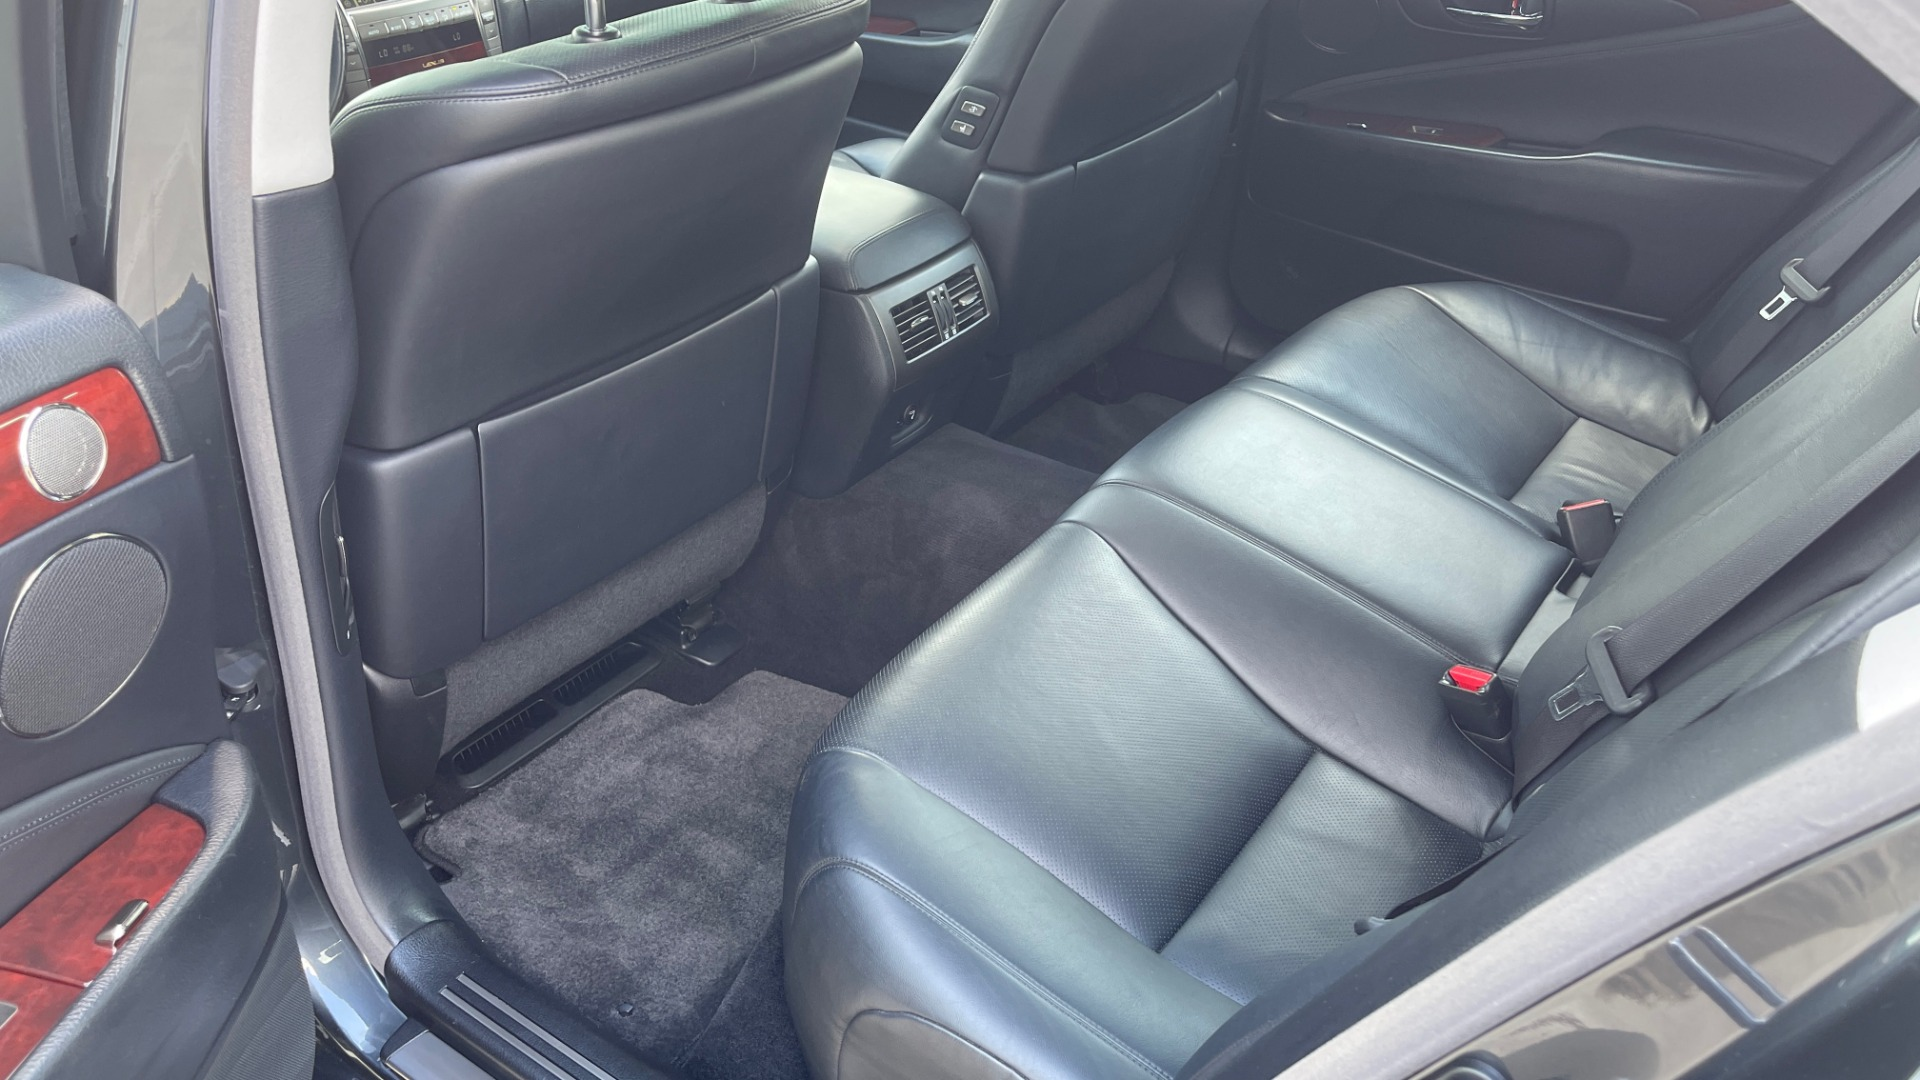 Used 2007 Lexus LS 460 SEDAN / COMFORT PKG / NAVIGATION / MARK LEVINSON / REARVIEW for sale $14,995 at Formula Imports in Charlotte NC 28227 53